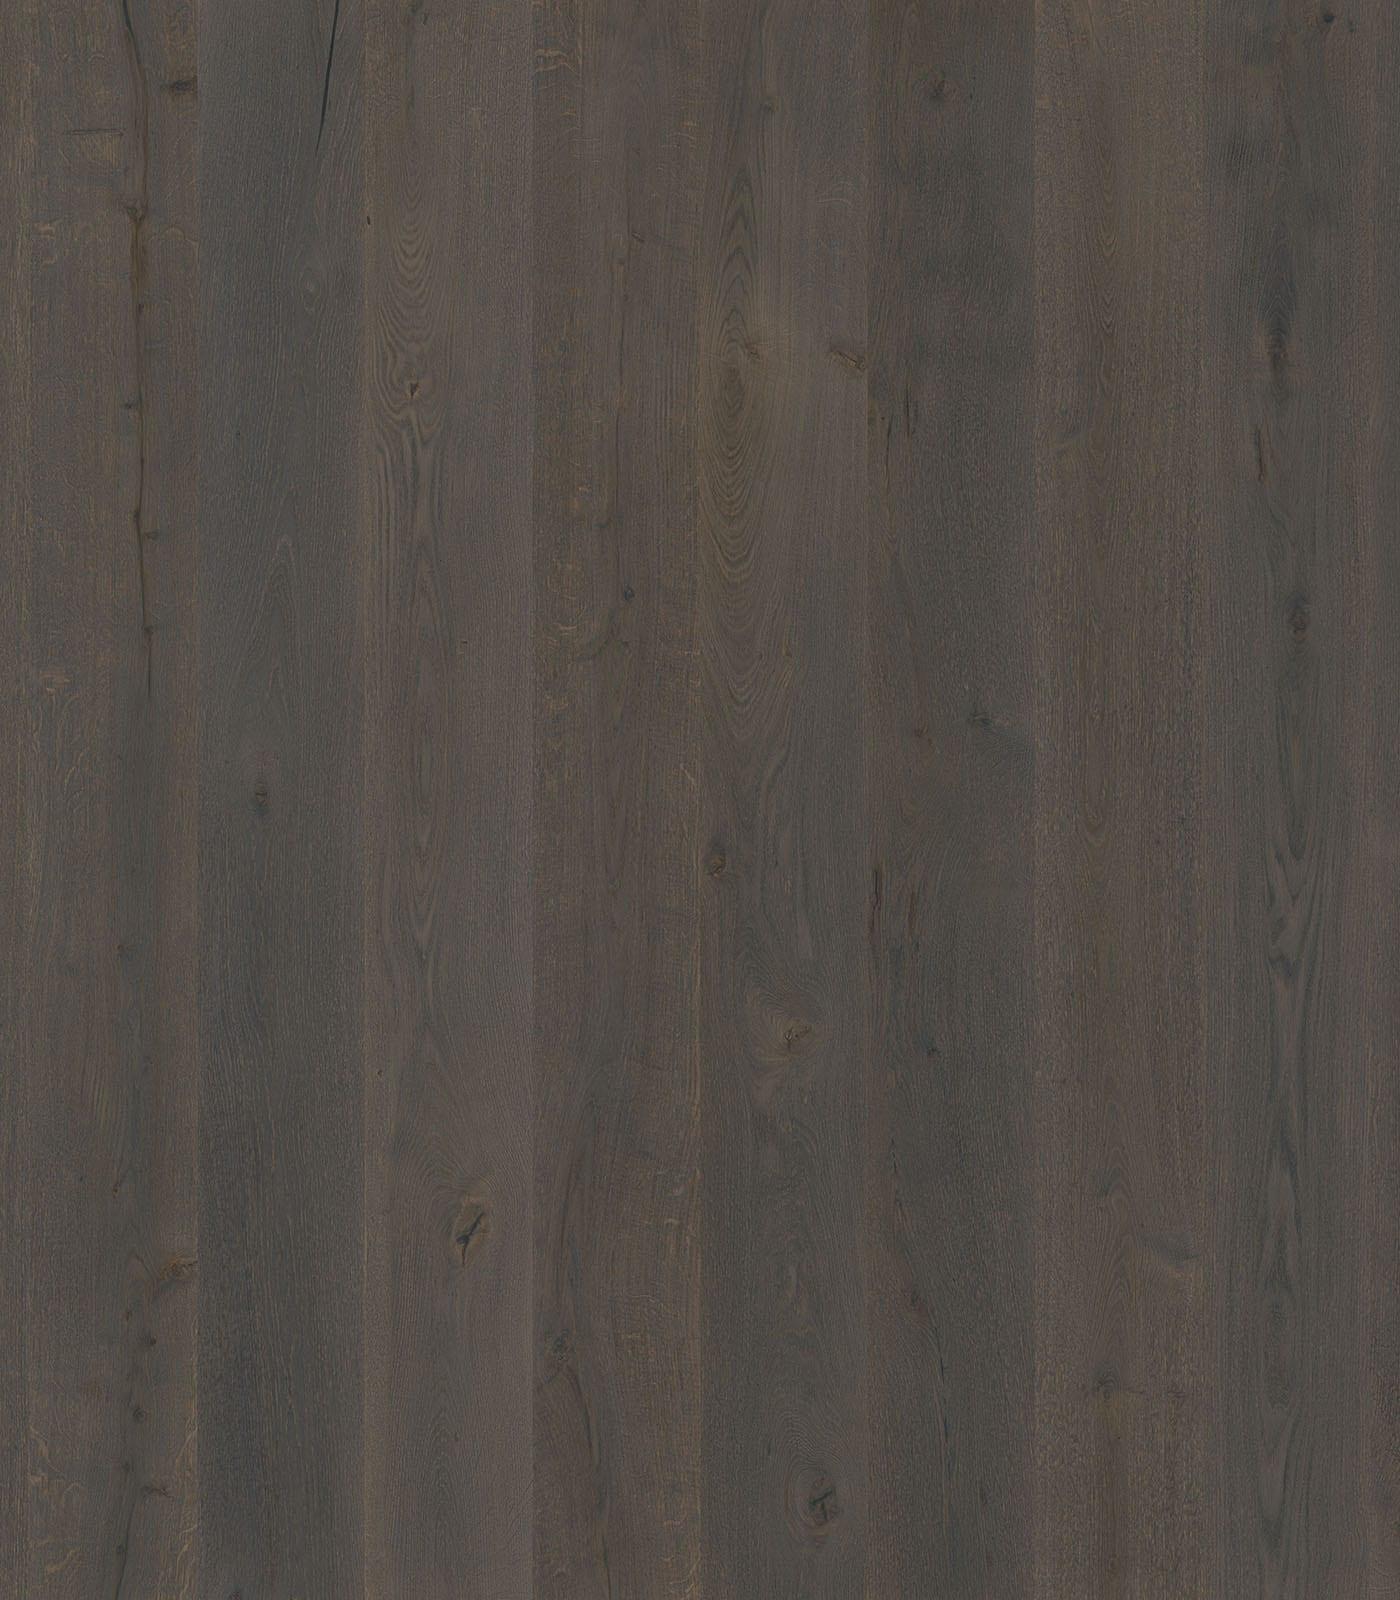 Kauai-Lifestyle Collection-European Oak floors-flat